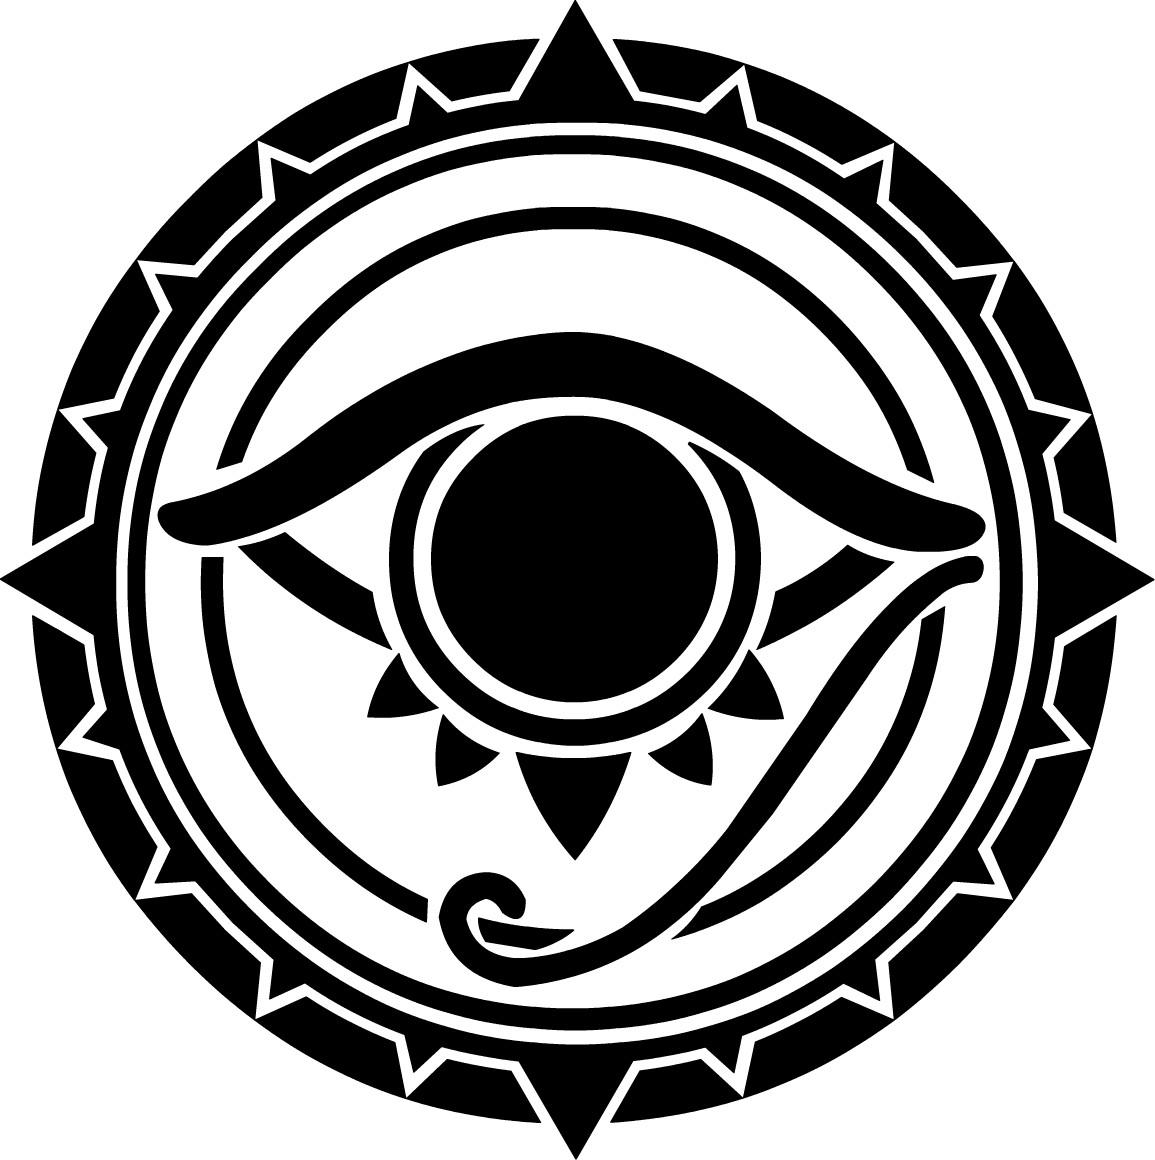 1155x1160 All Seeing Eye